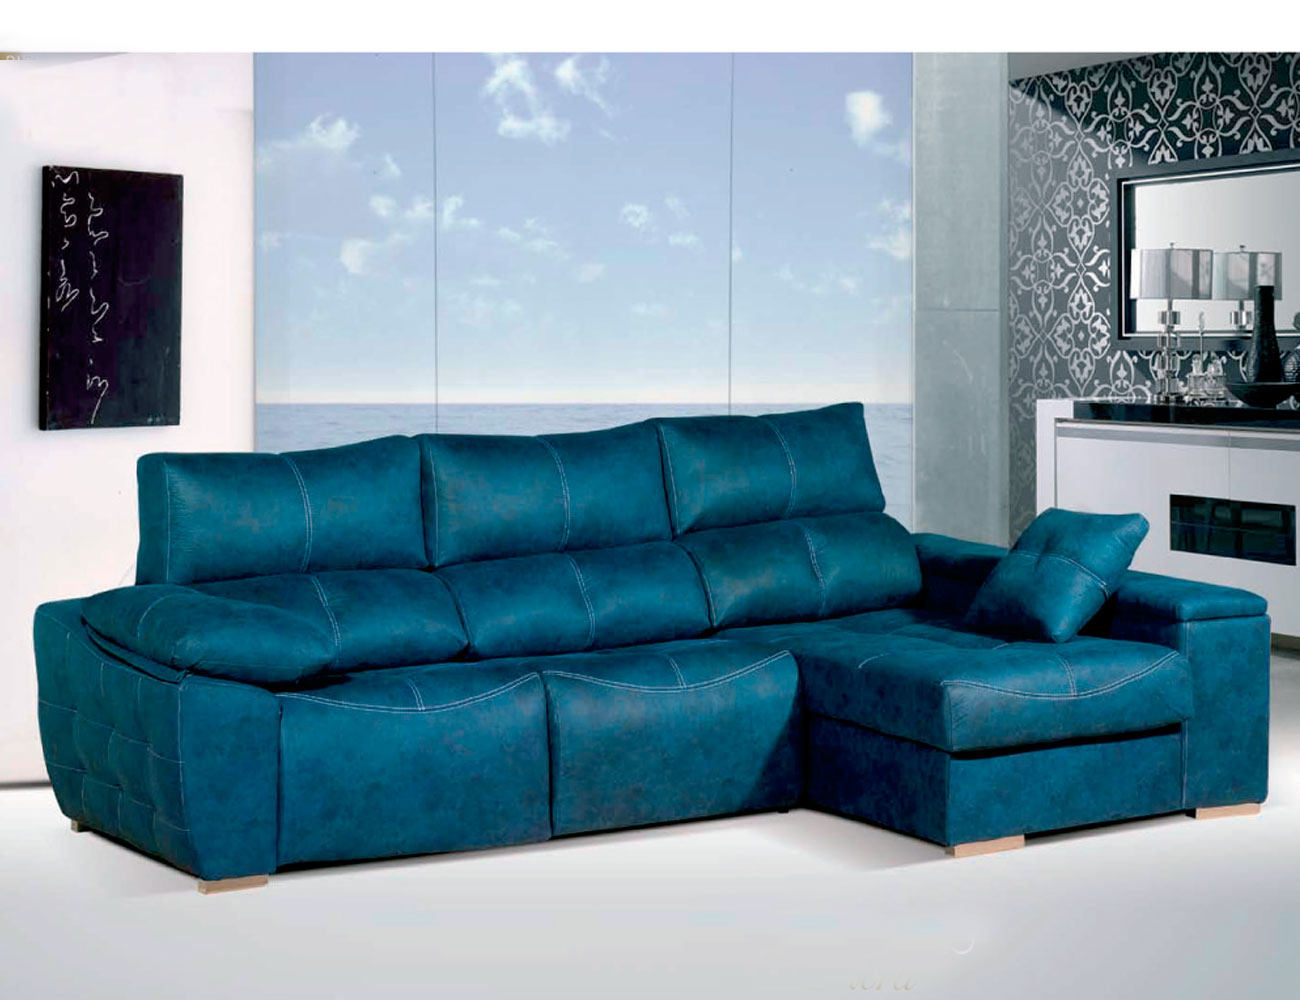 Sofa chaiselongue relax 2 motores anti manchas turquesa20